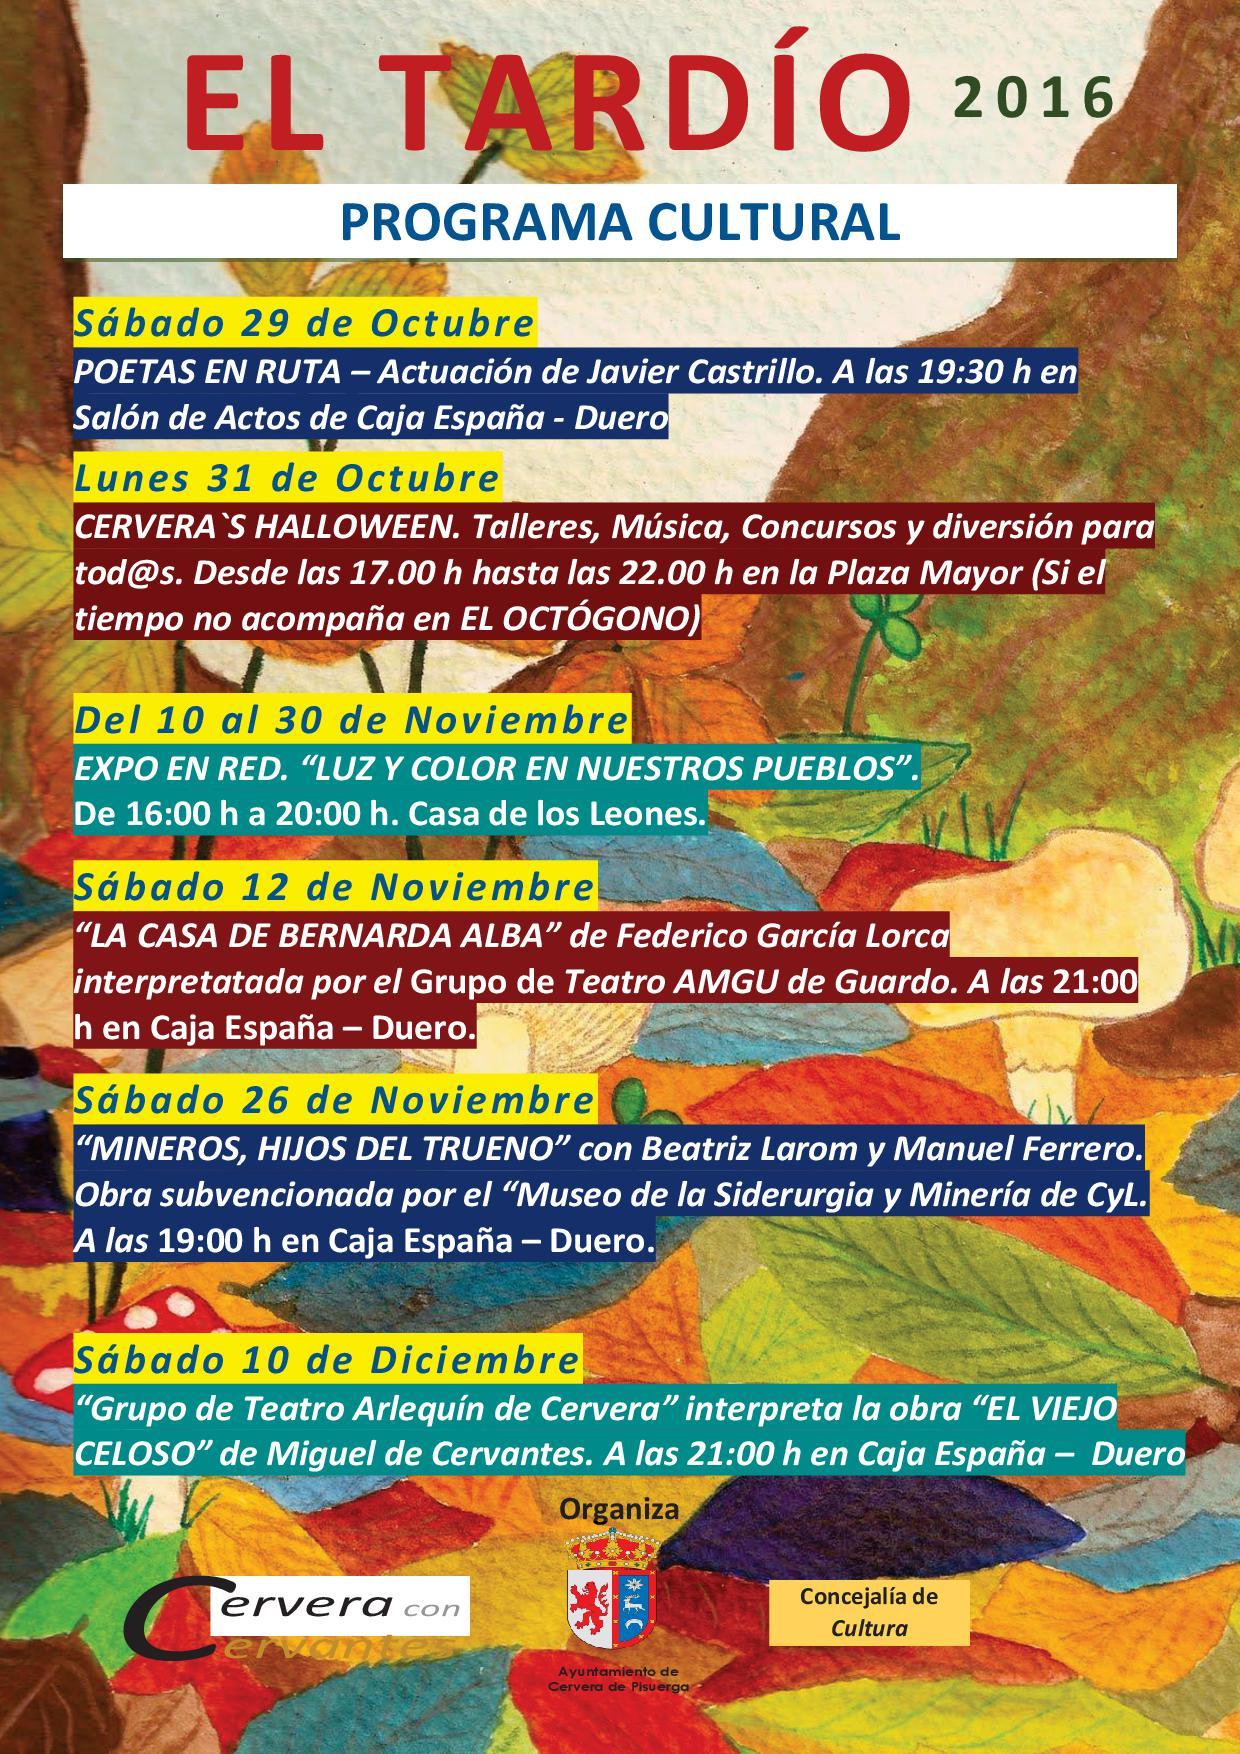 Programa cultural-EL TARDÍO 2016